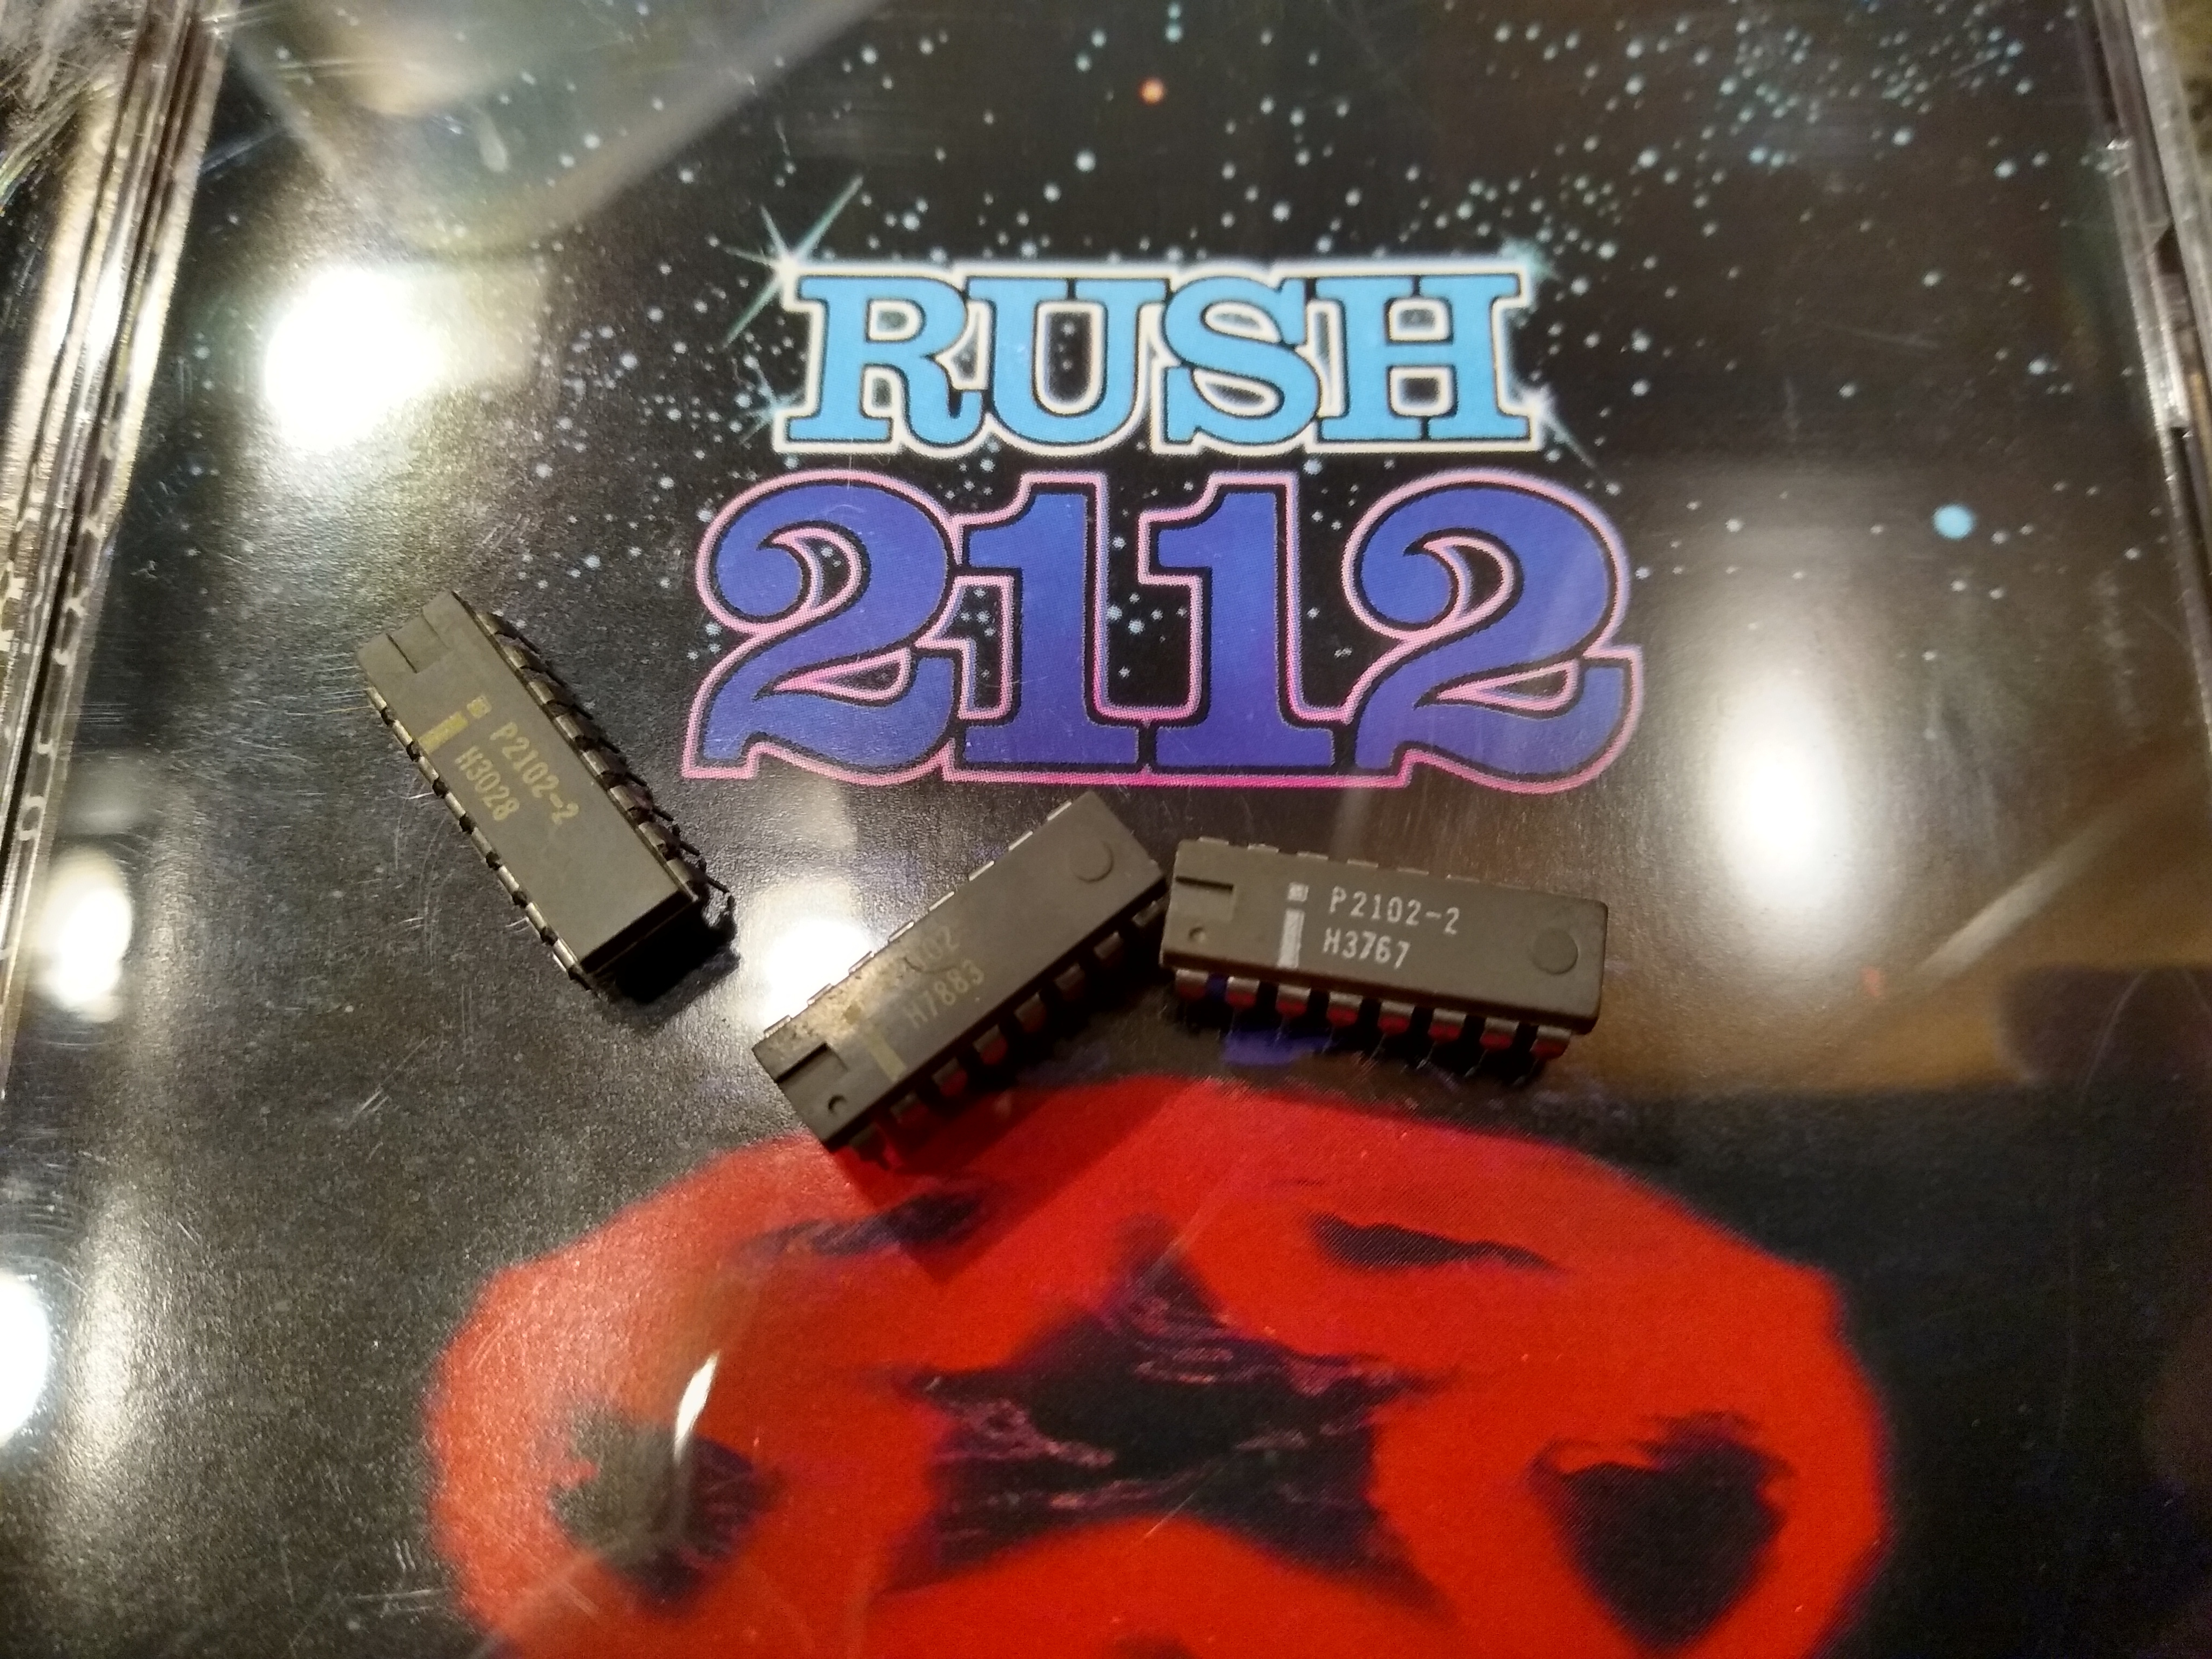 2102R.jpg